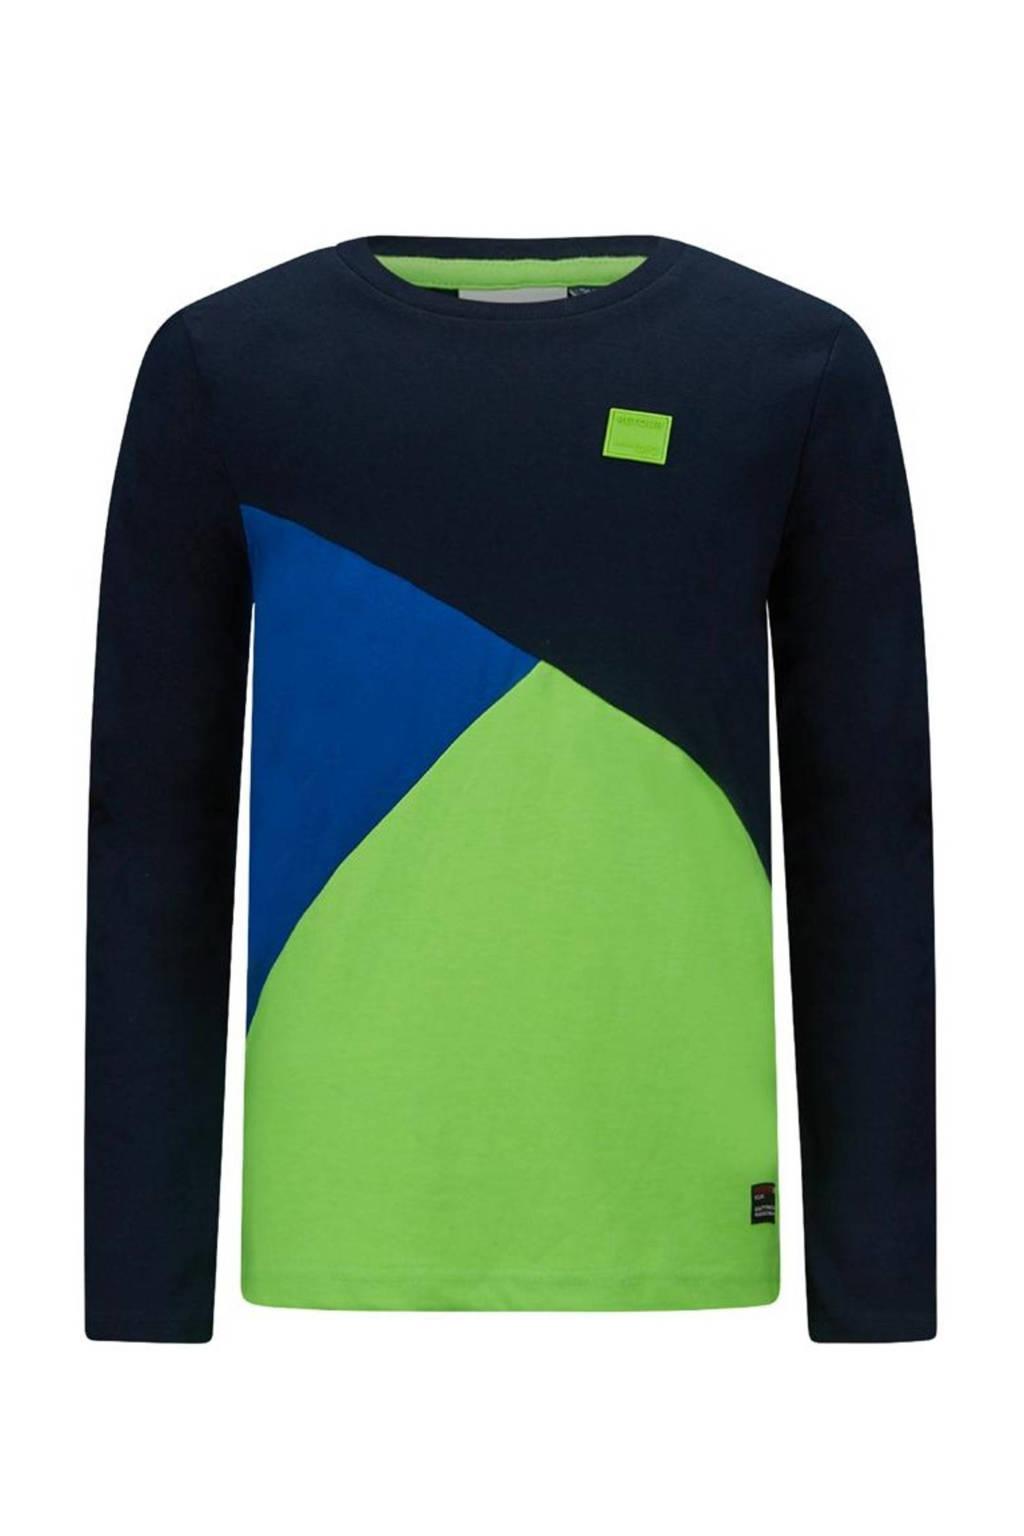 Retour Denim longsleeve Torsten donkerblauw/neon groen/blauw, Donkerblauw/neon groen/blauw